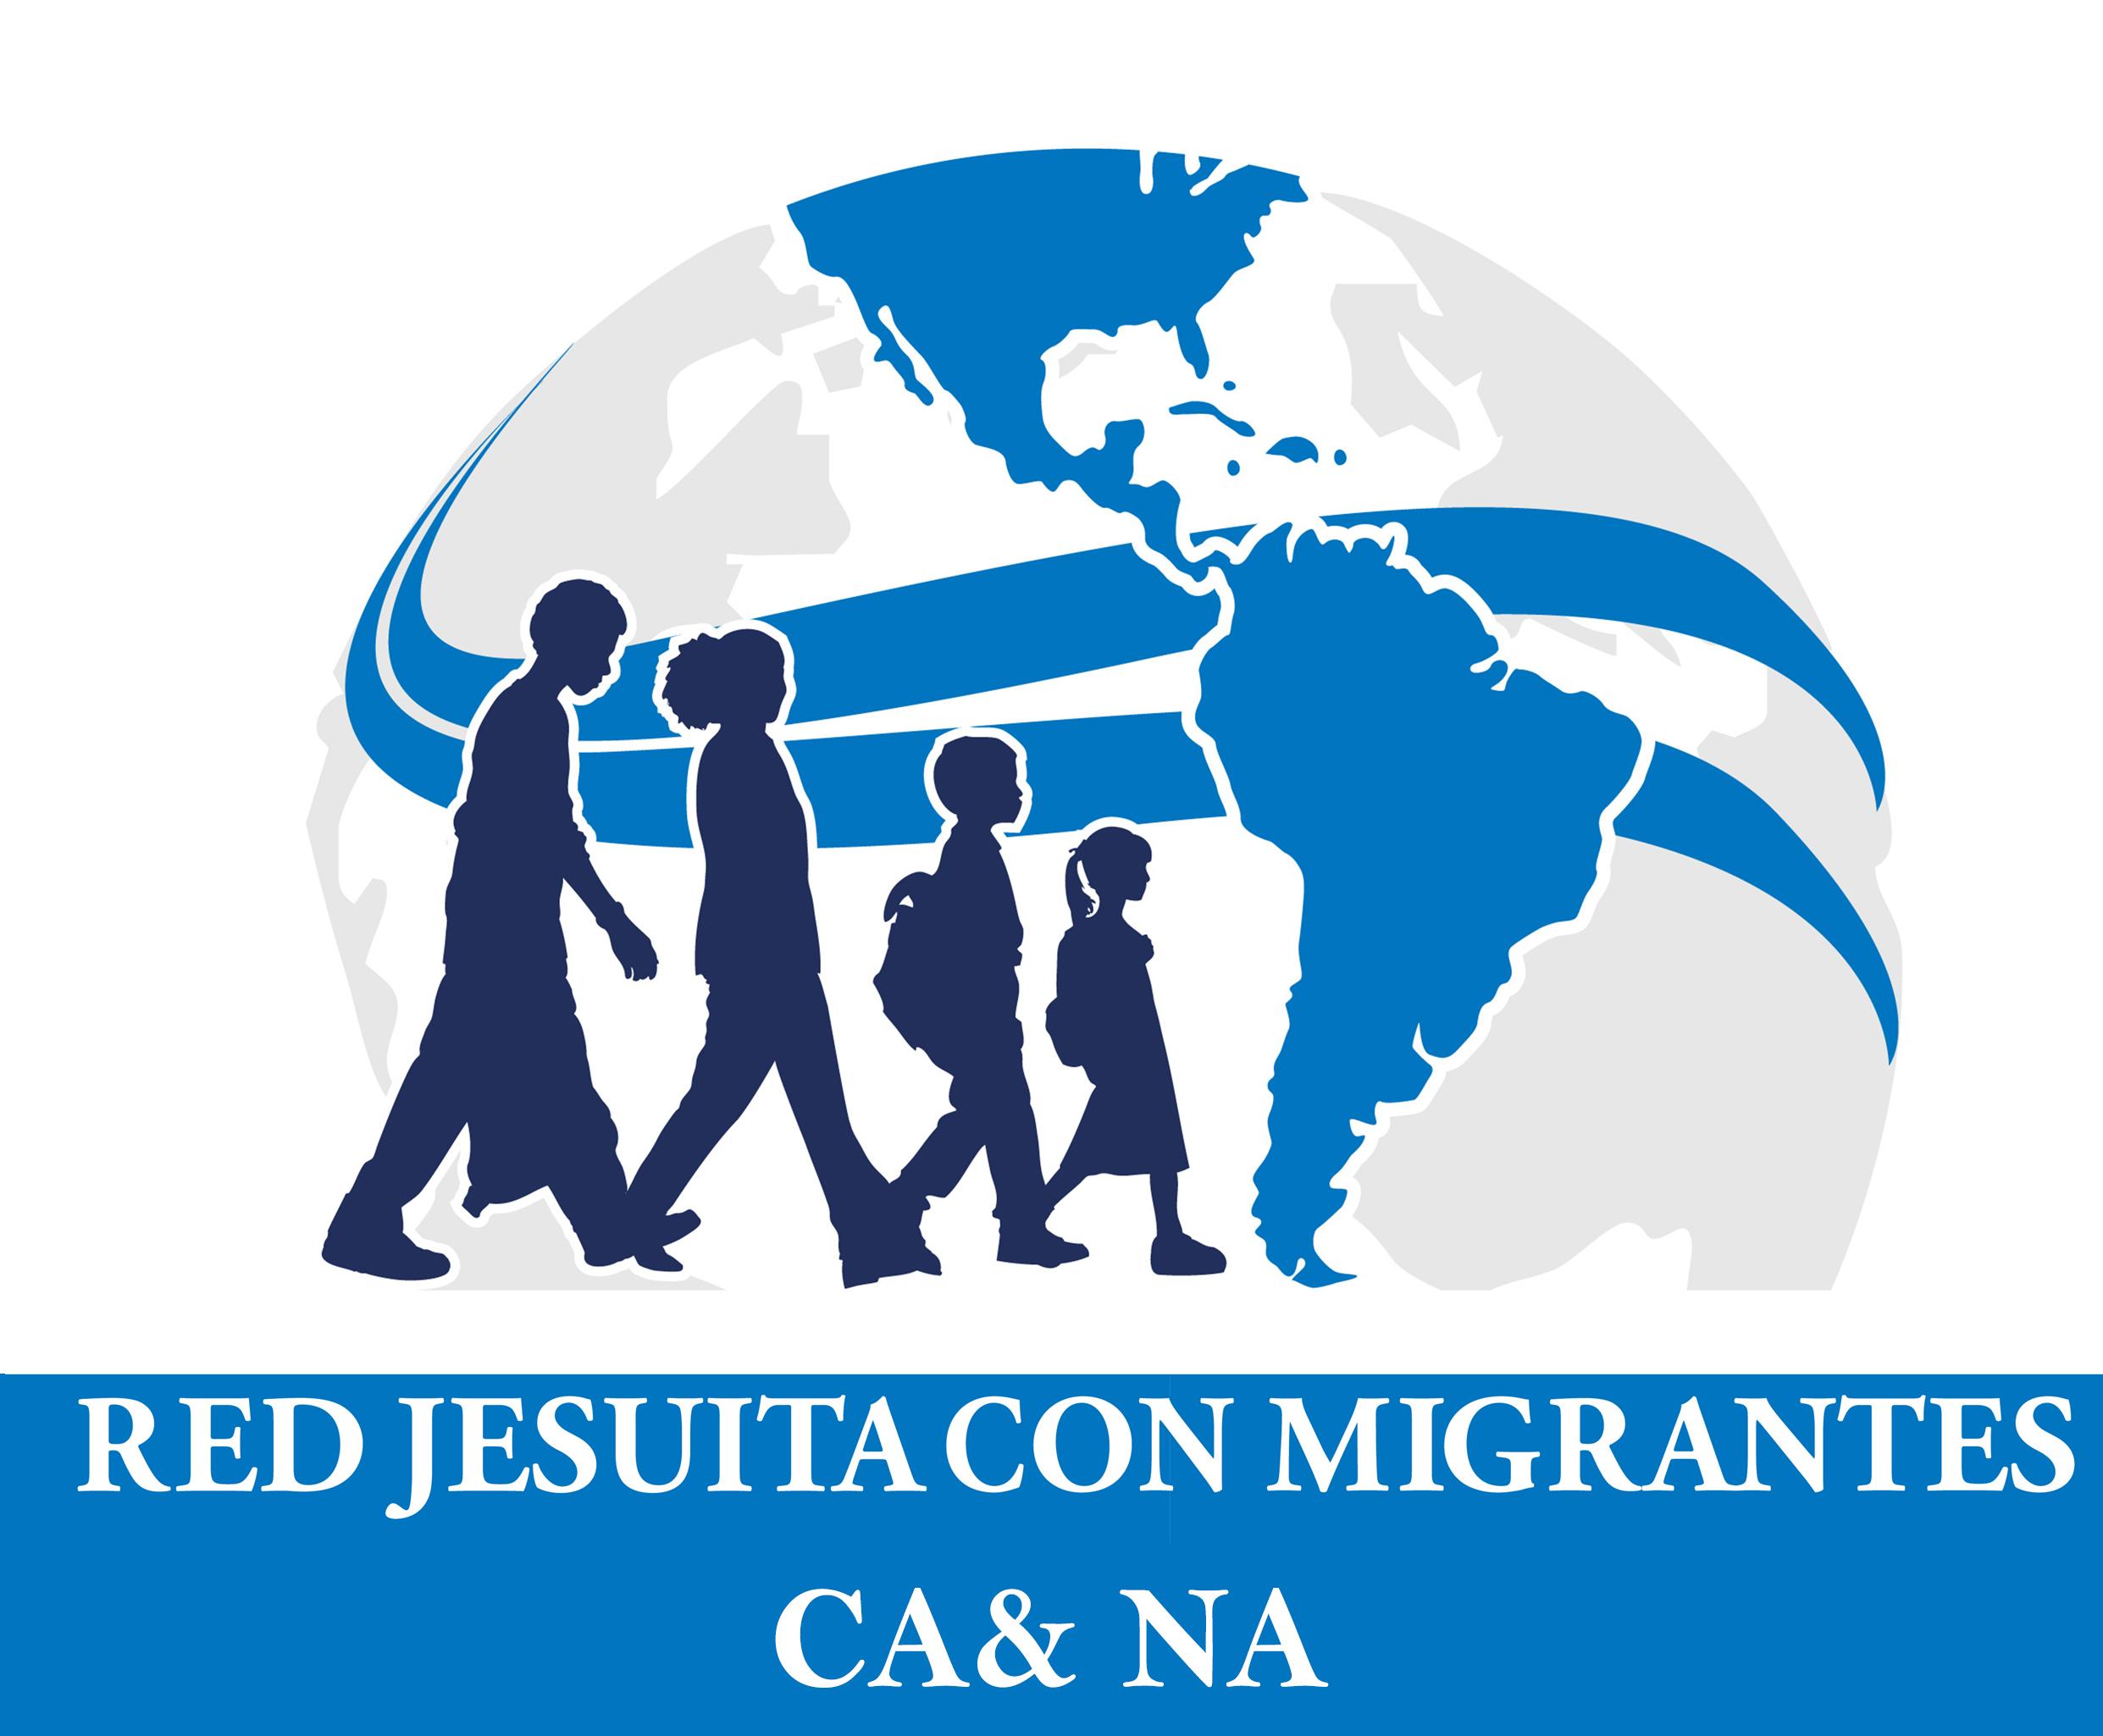 Red-jesuita-con-migrantes.jpg